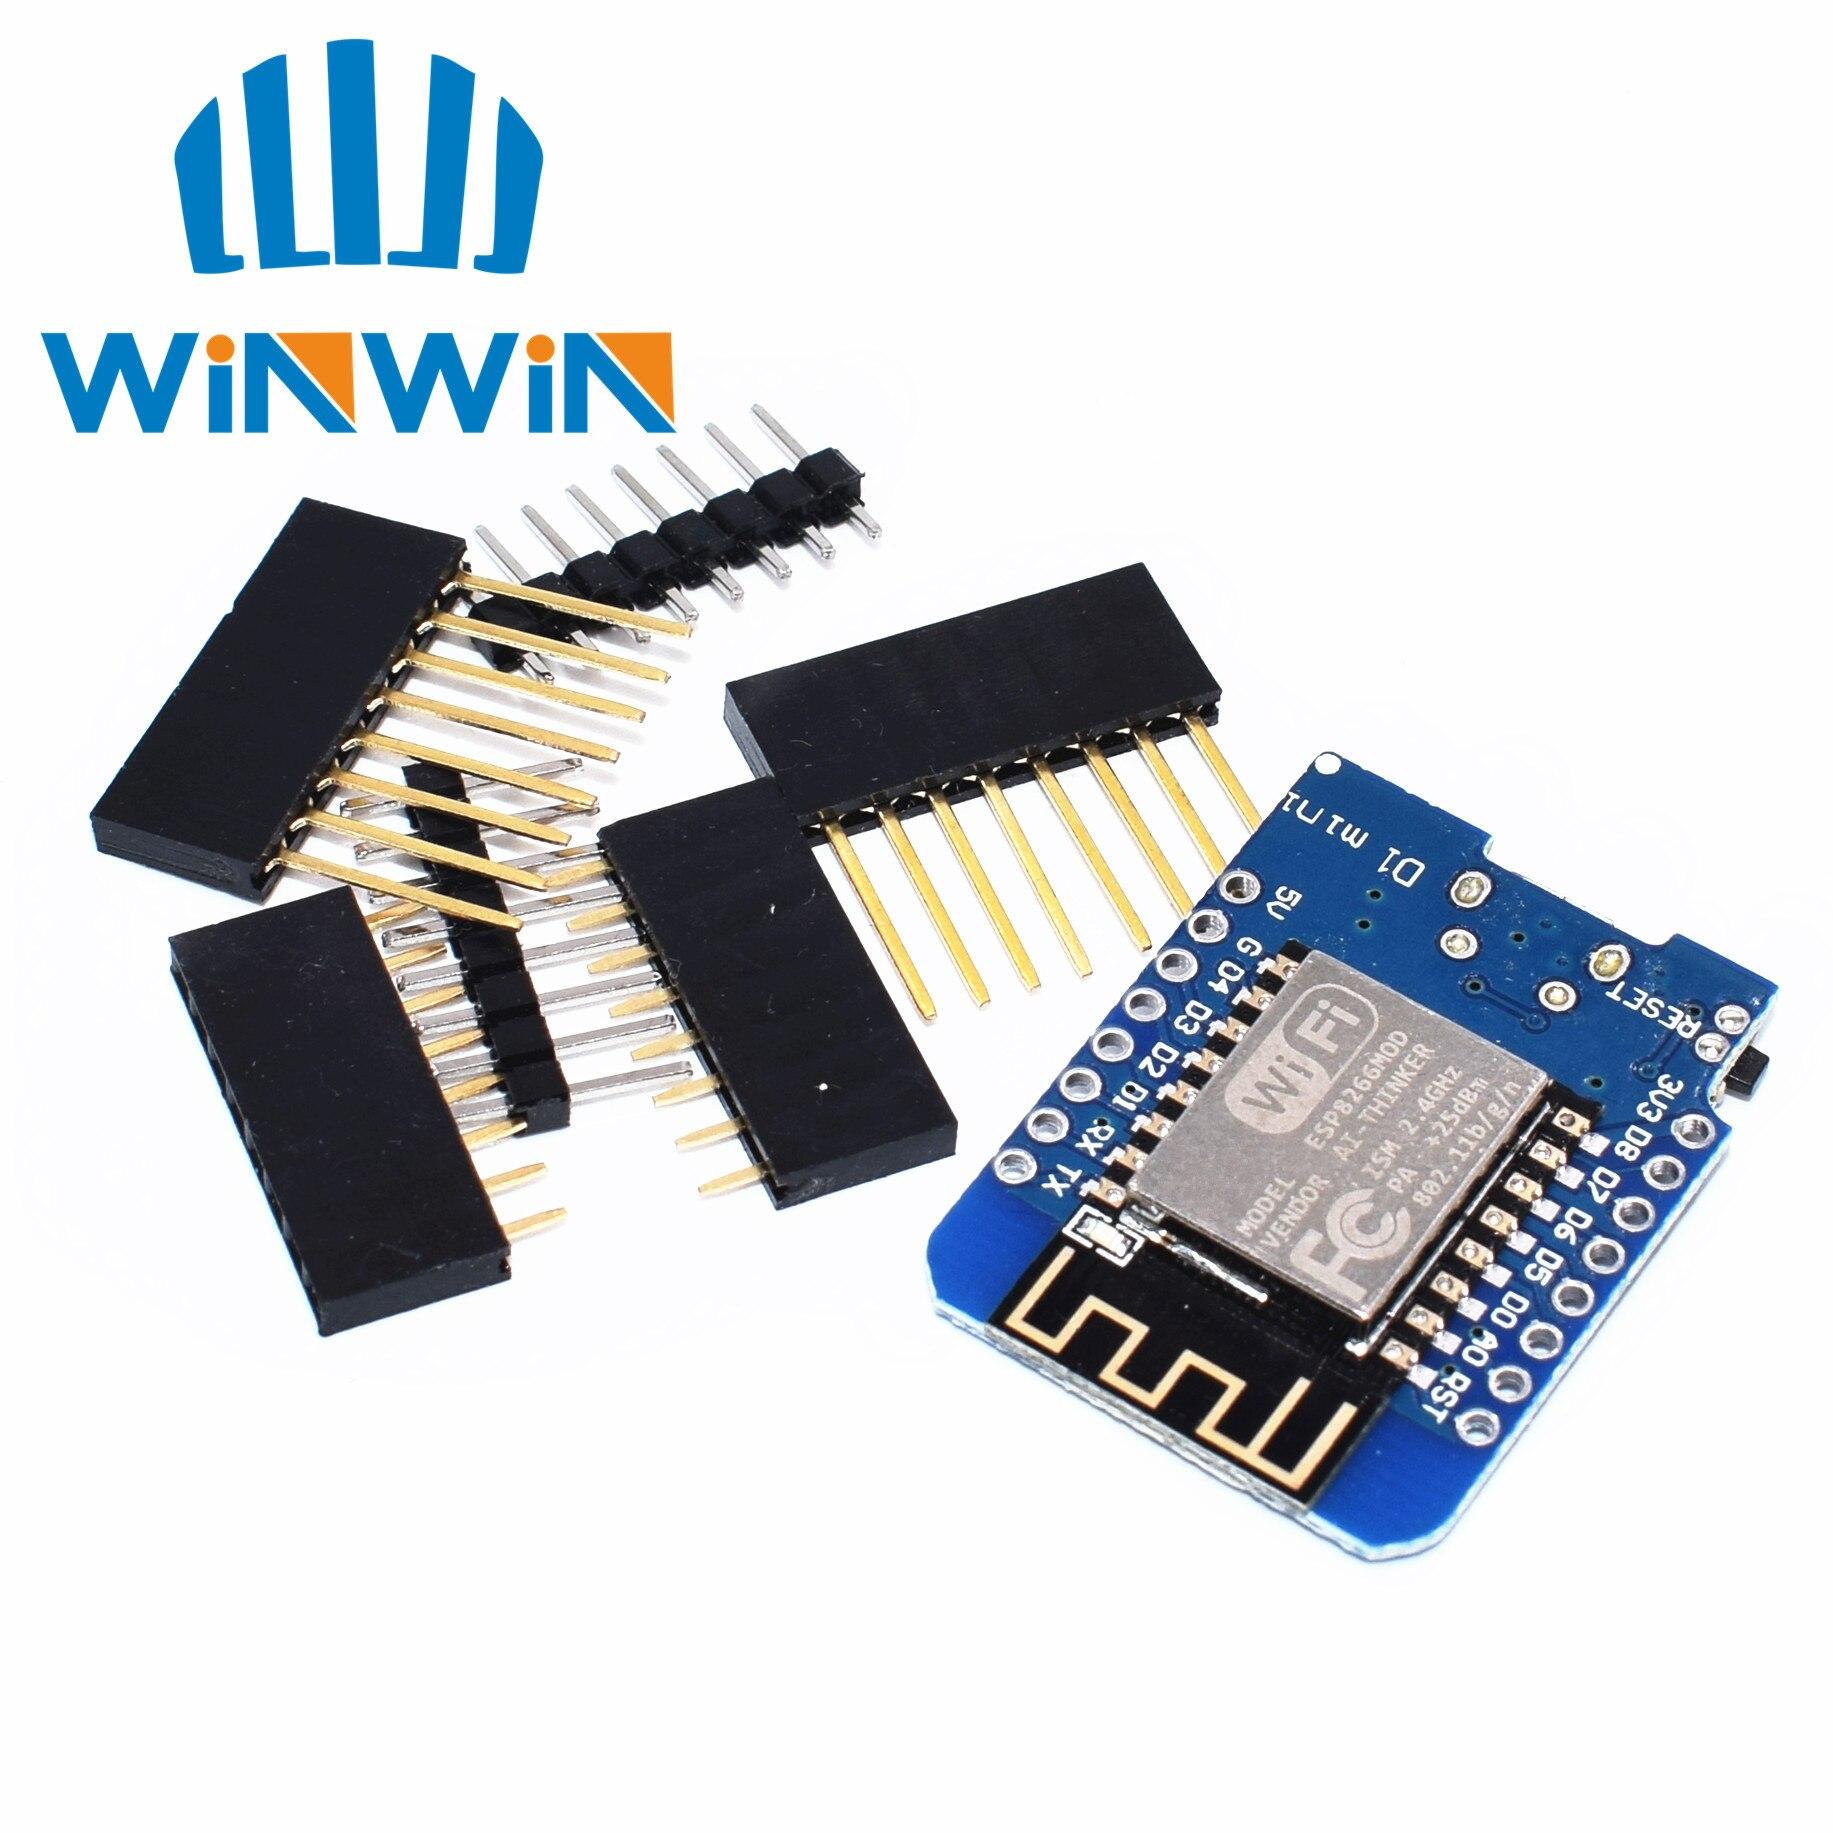 50pcs D1 mini Mini NodeMcu 4M bytes Lua WIFI Internet of Things development board based ESP8266